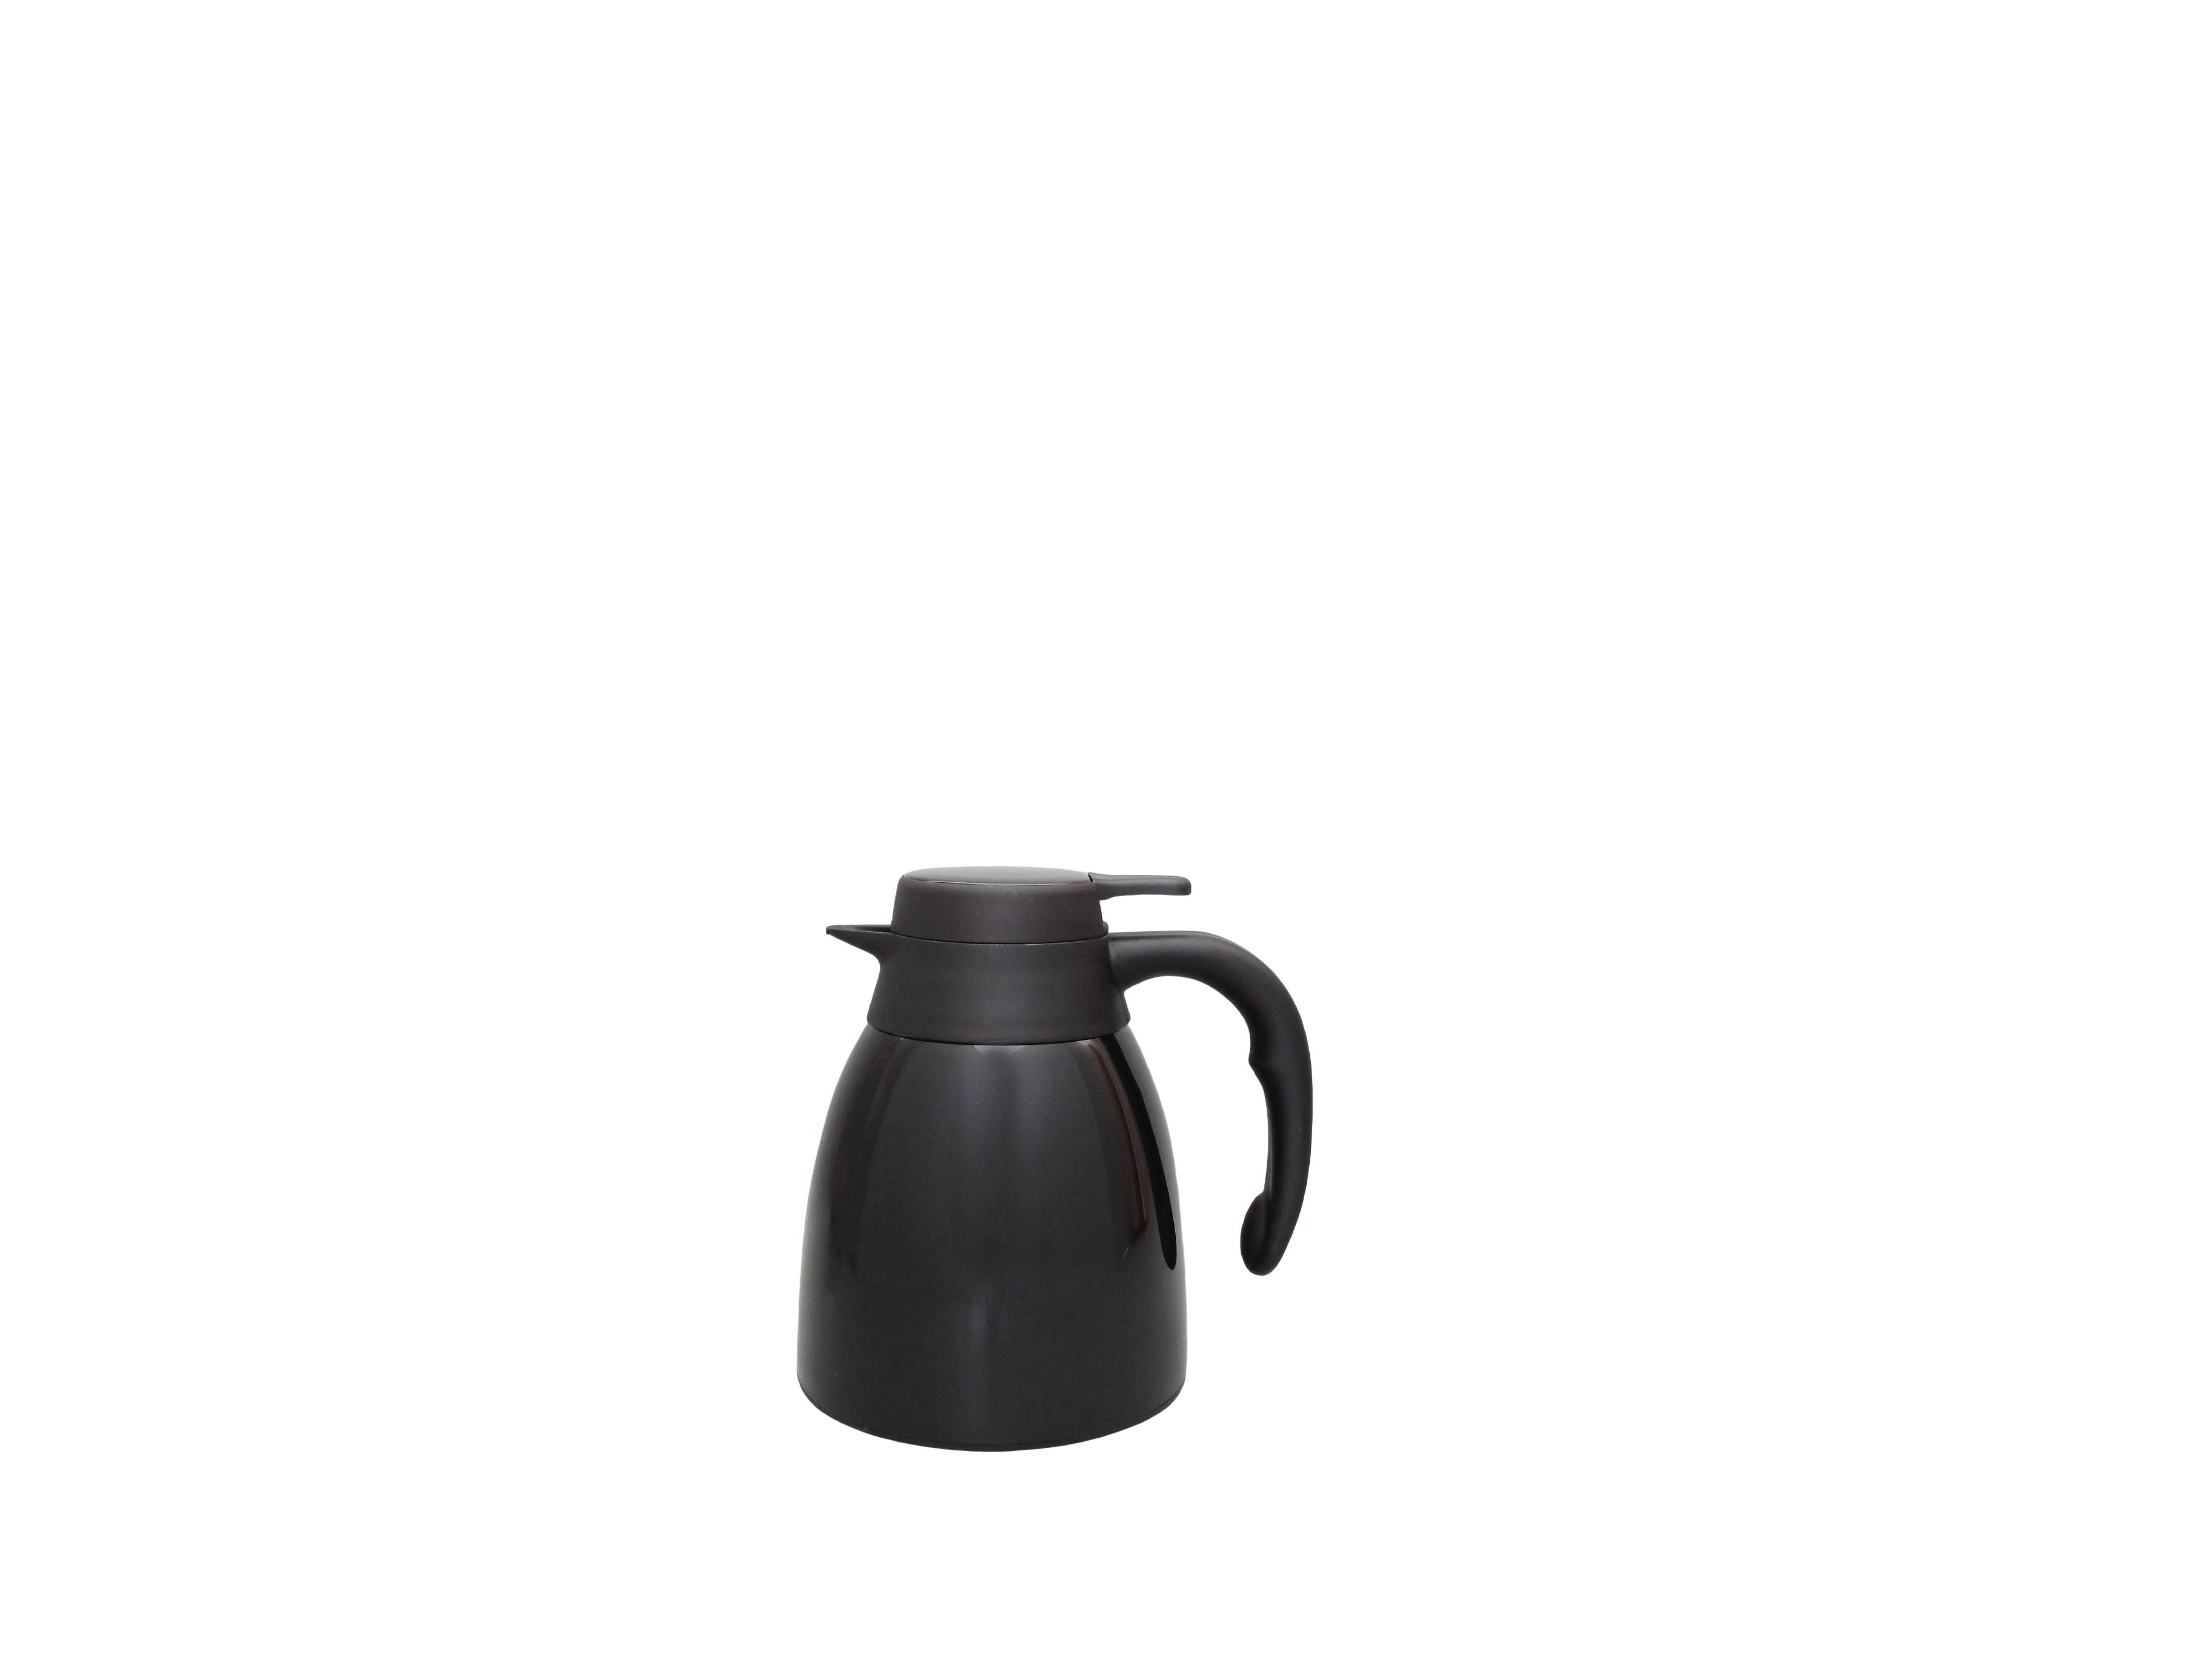 FUJI10-002 - Vacuum carafe SS black unbreakable 1.0 L - Isobel